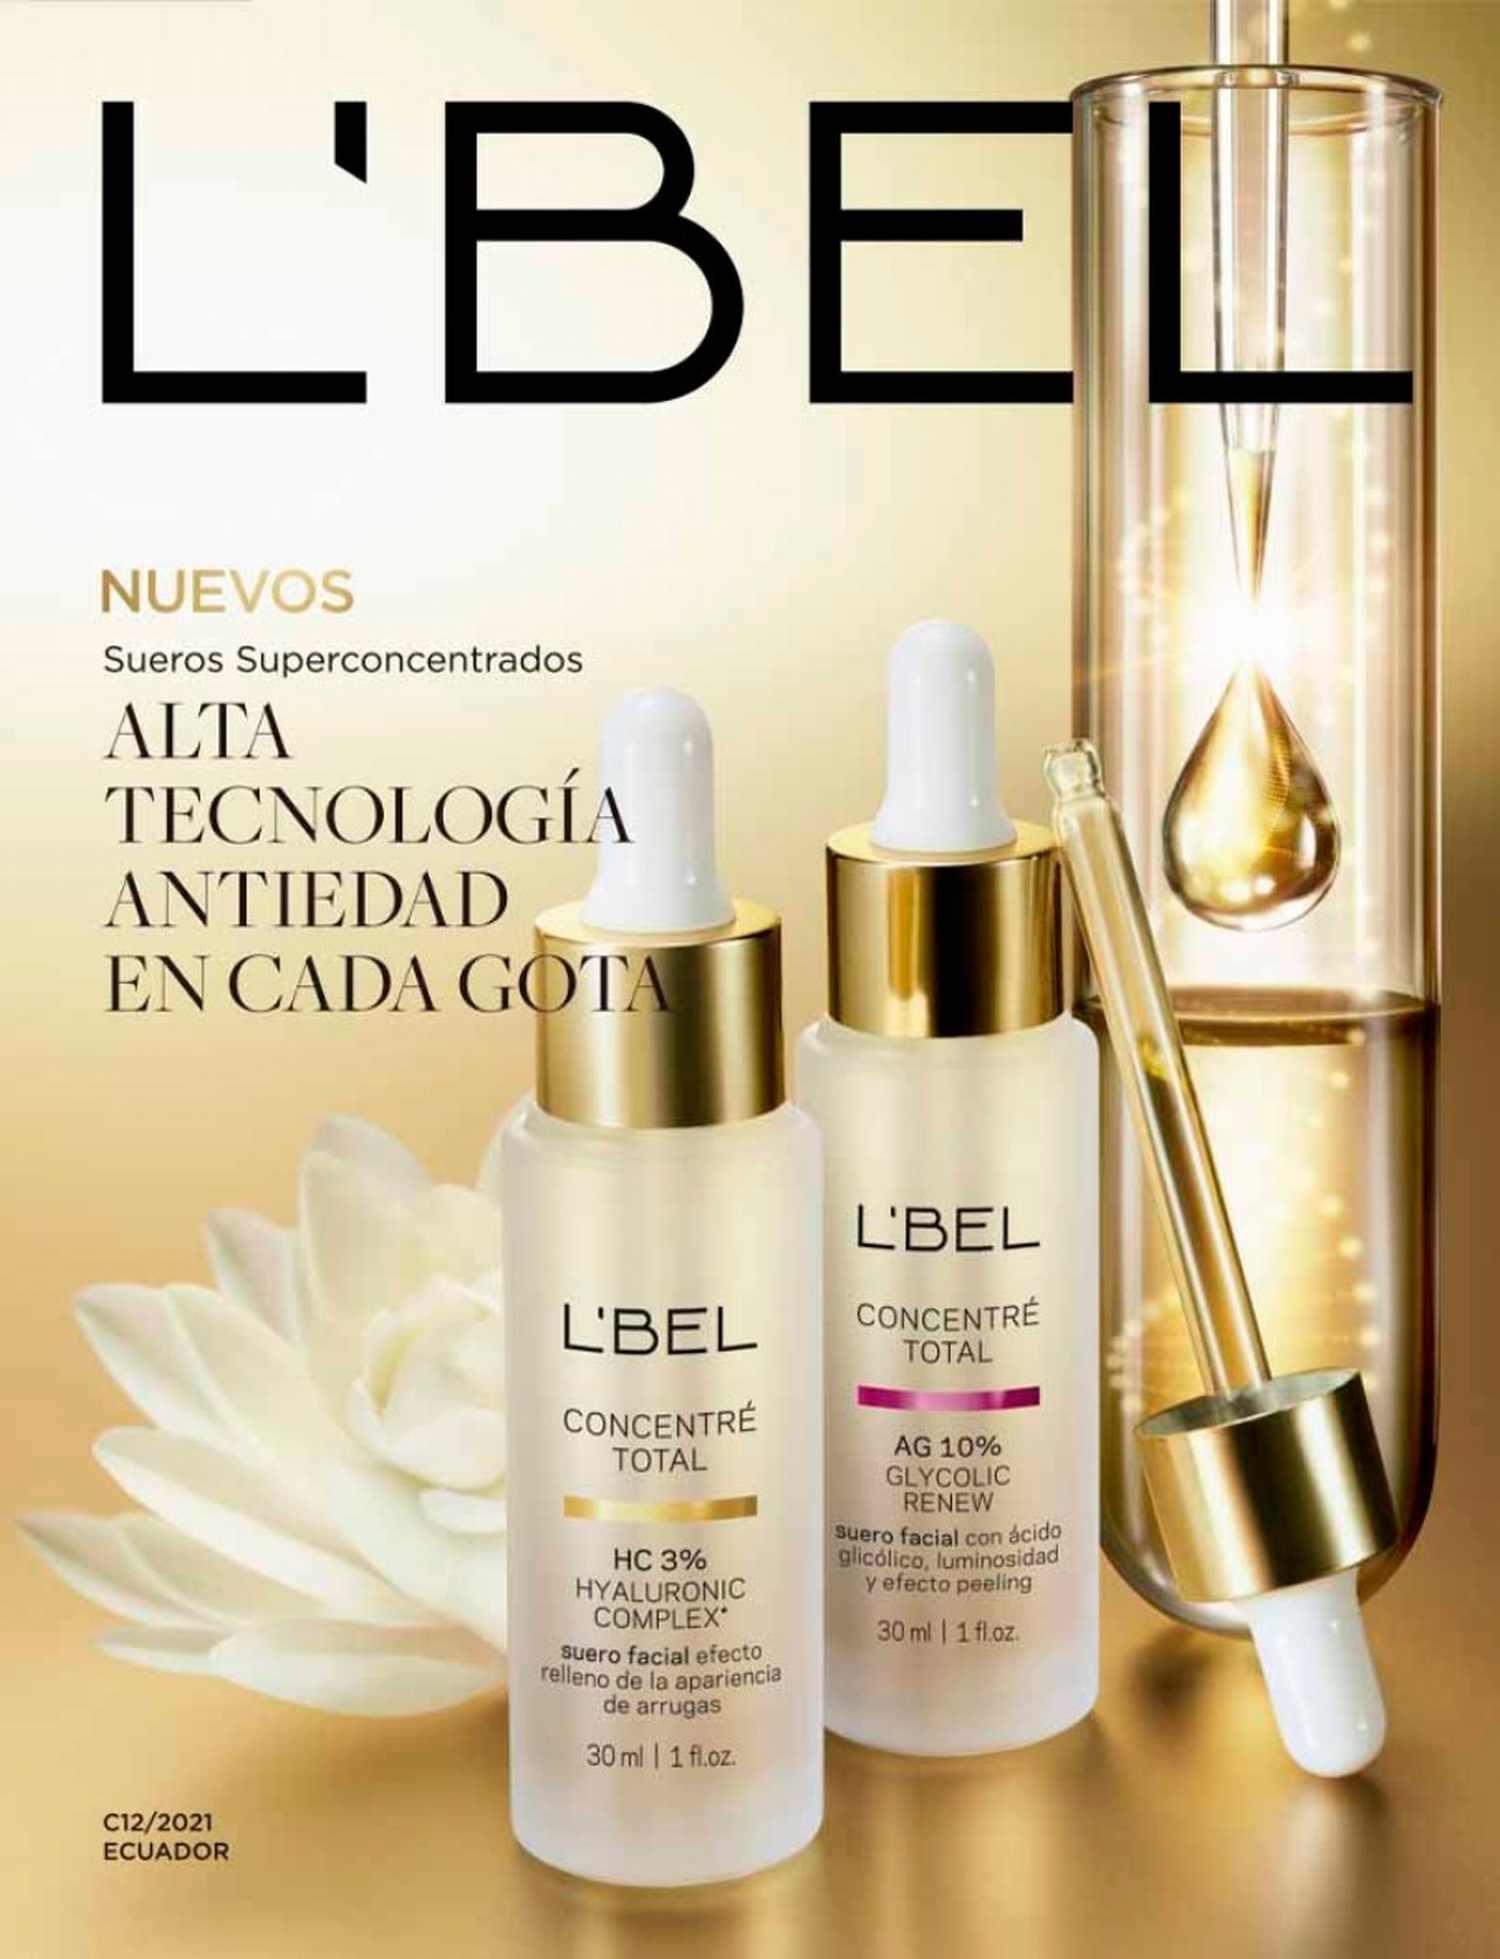 Catálogo L'Bel Campaña 12 2021 Ecuador